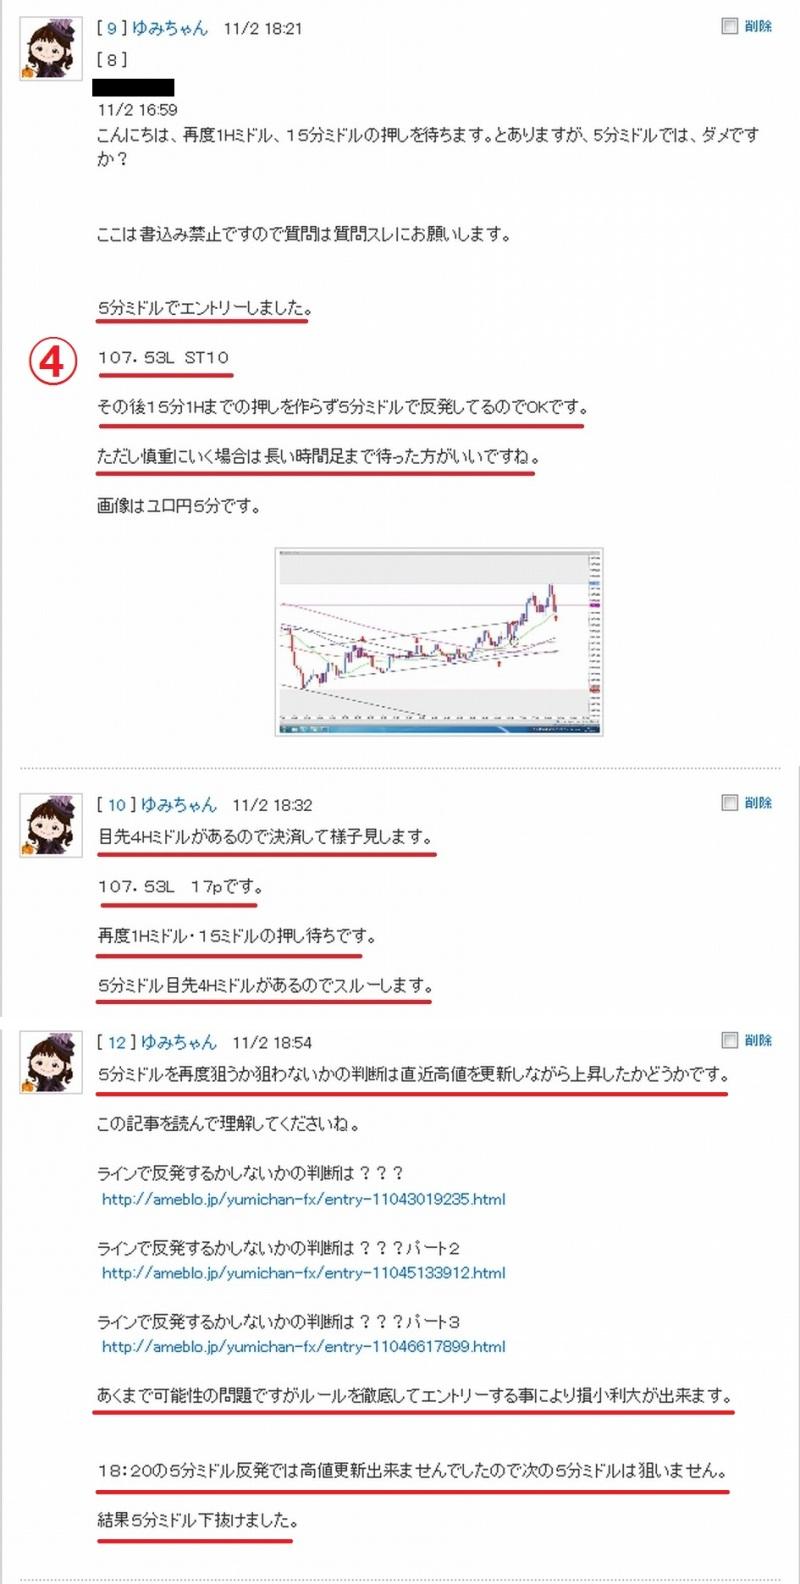 blog_import_513aef16dba6d